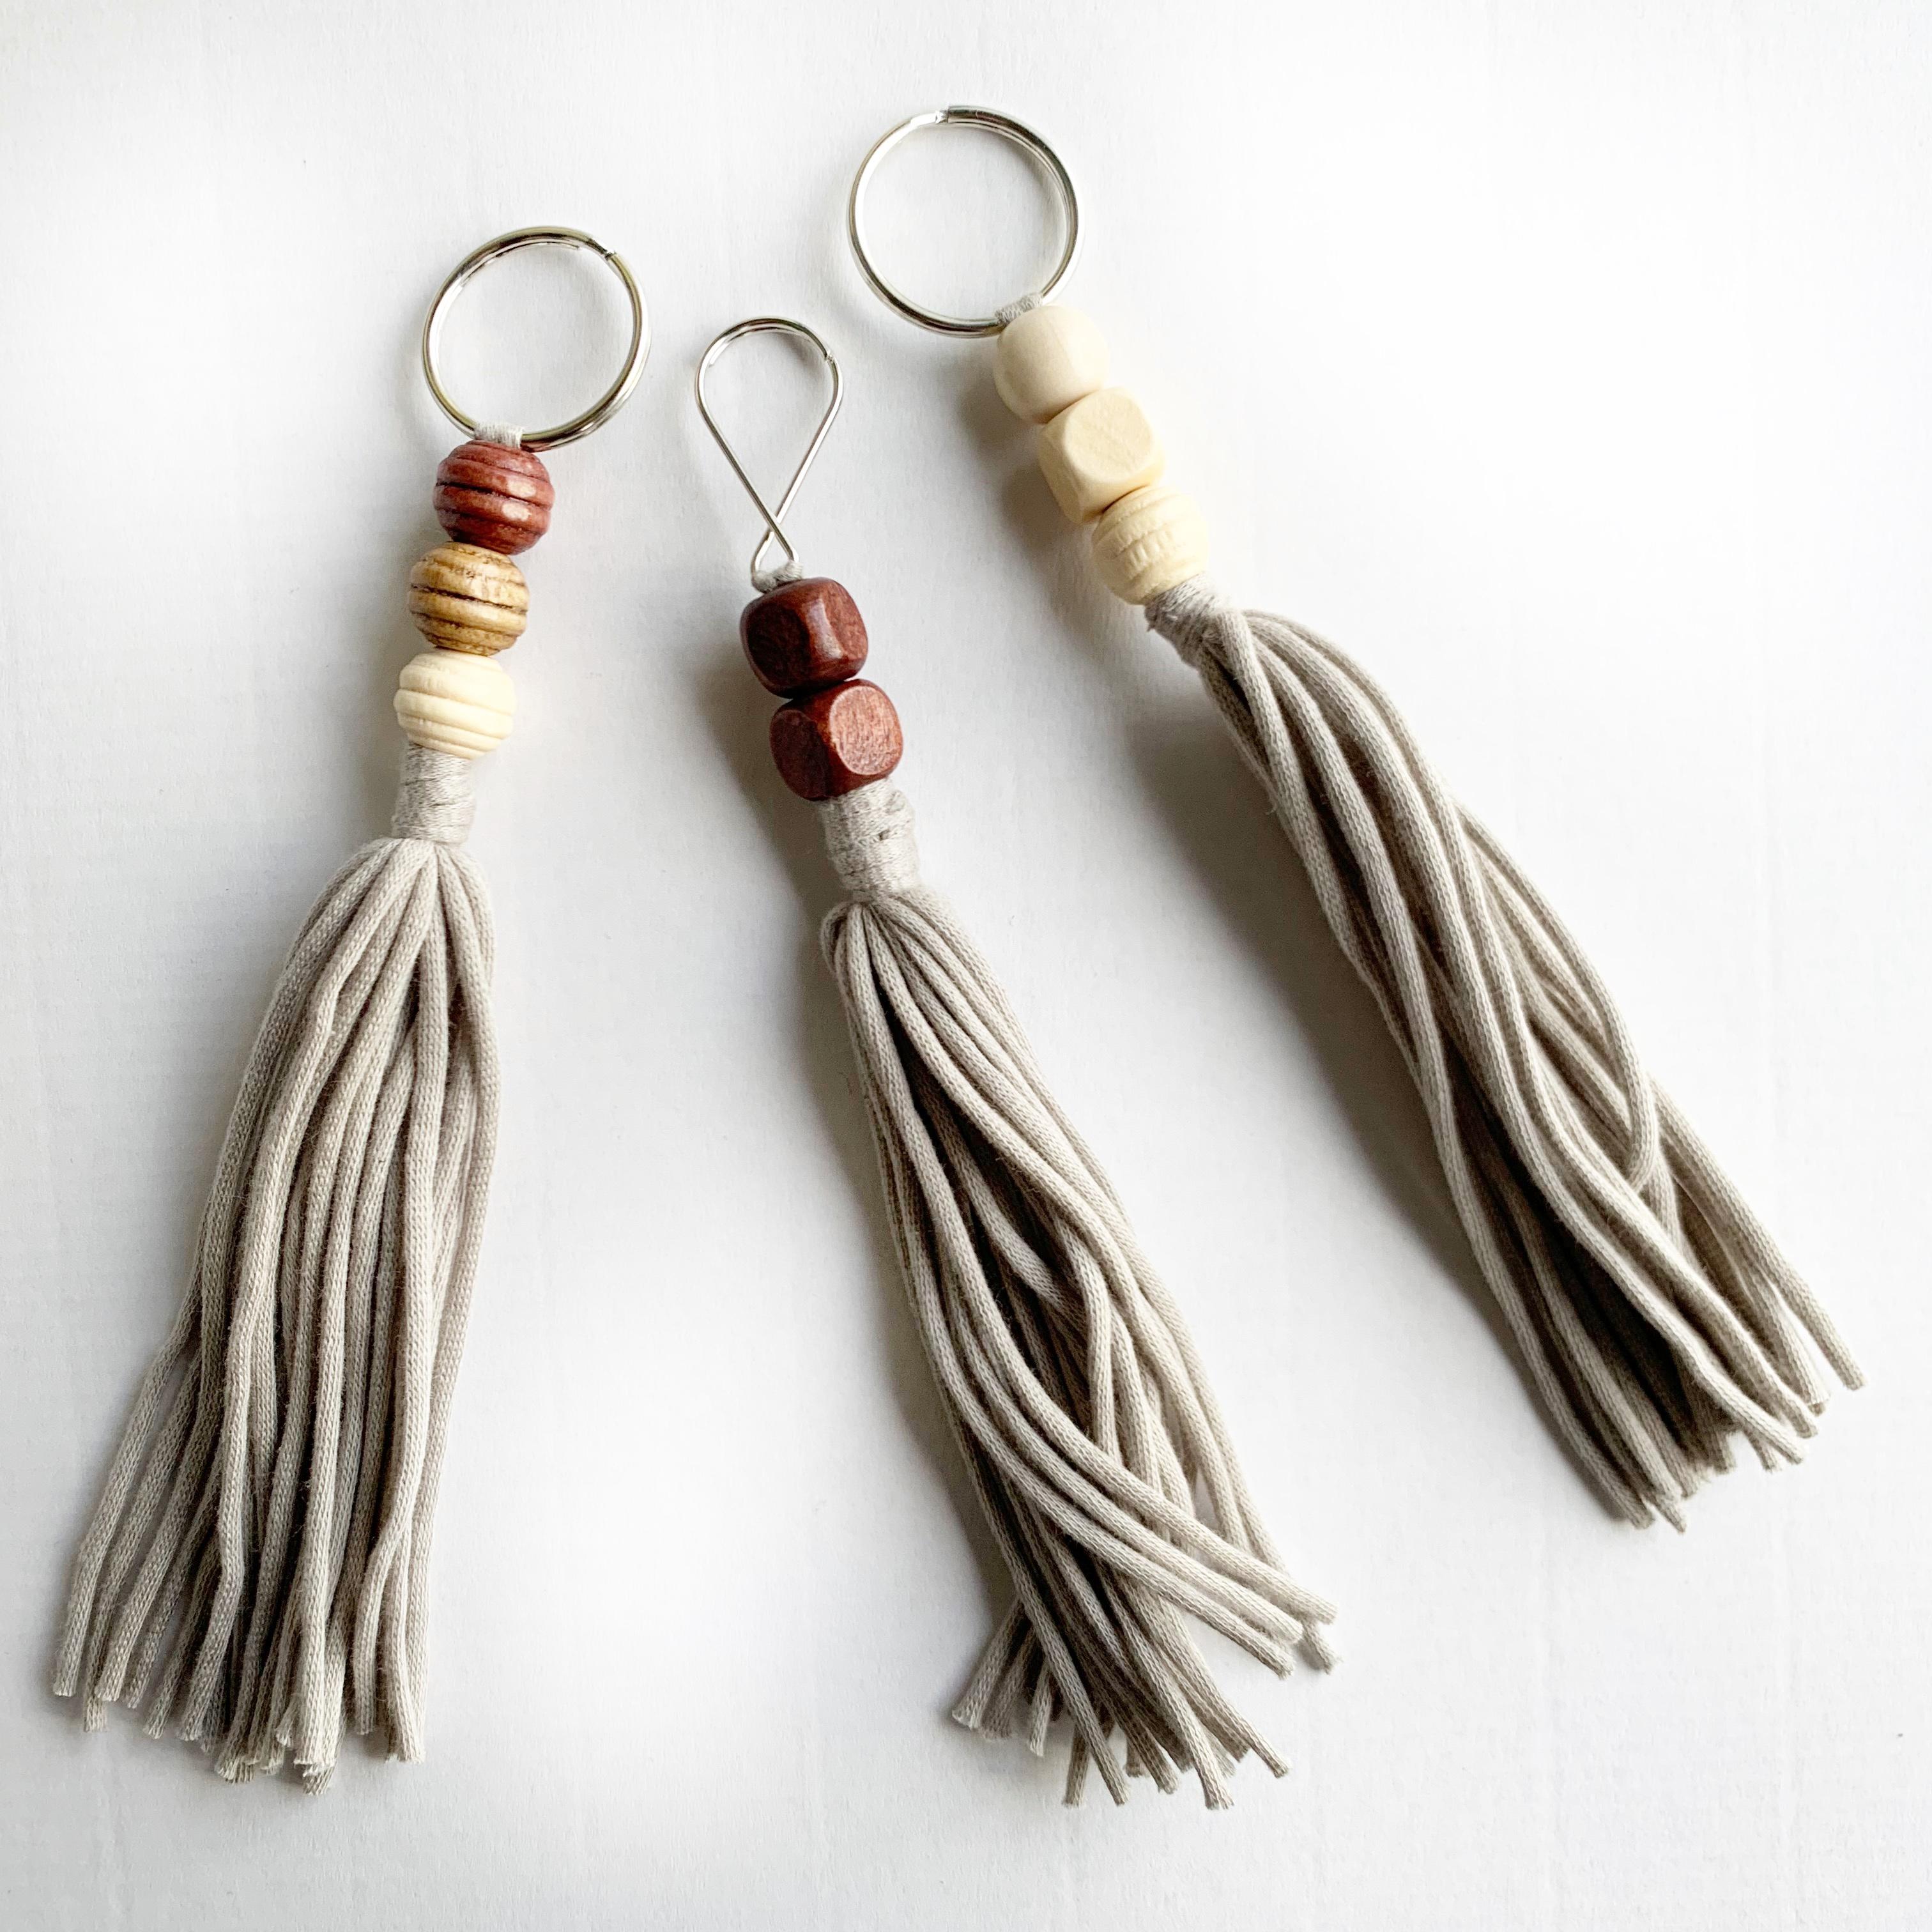 Tuesday Craft Corner: Chic Tassels